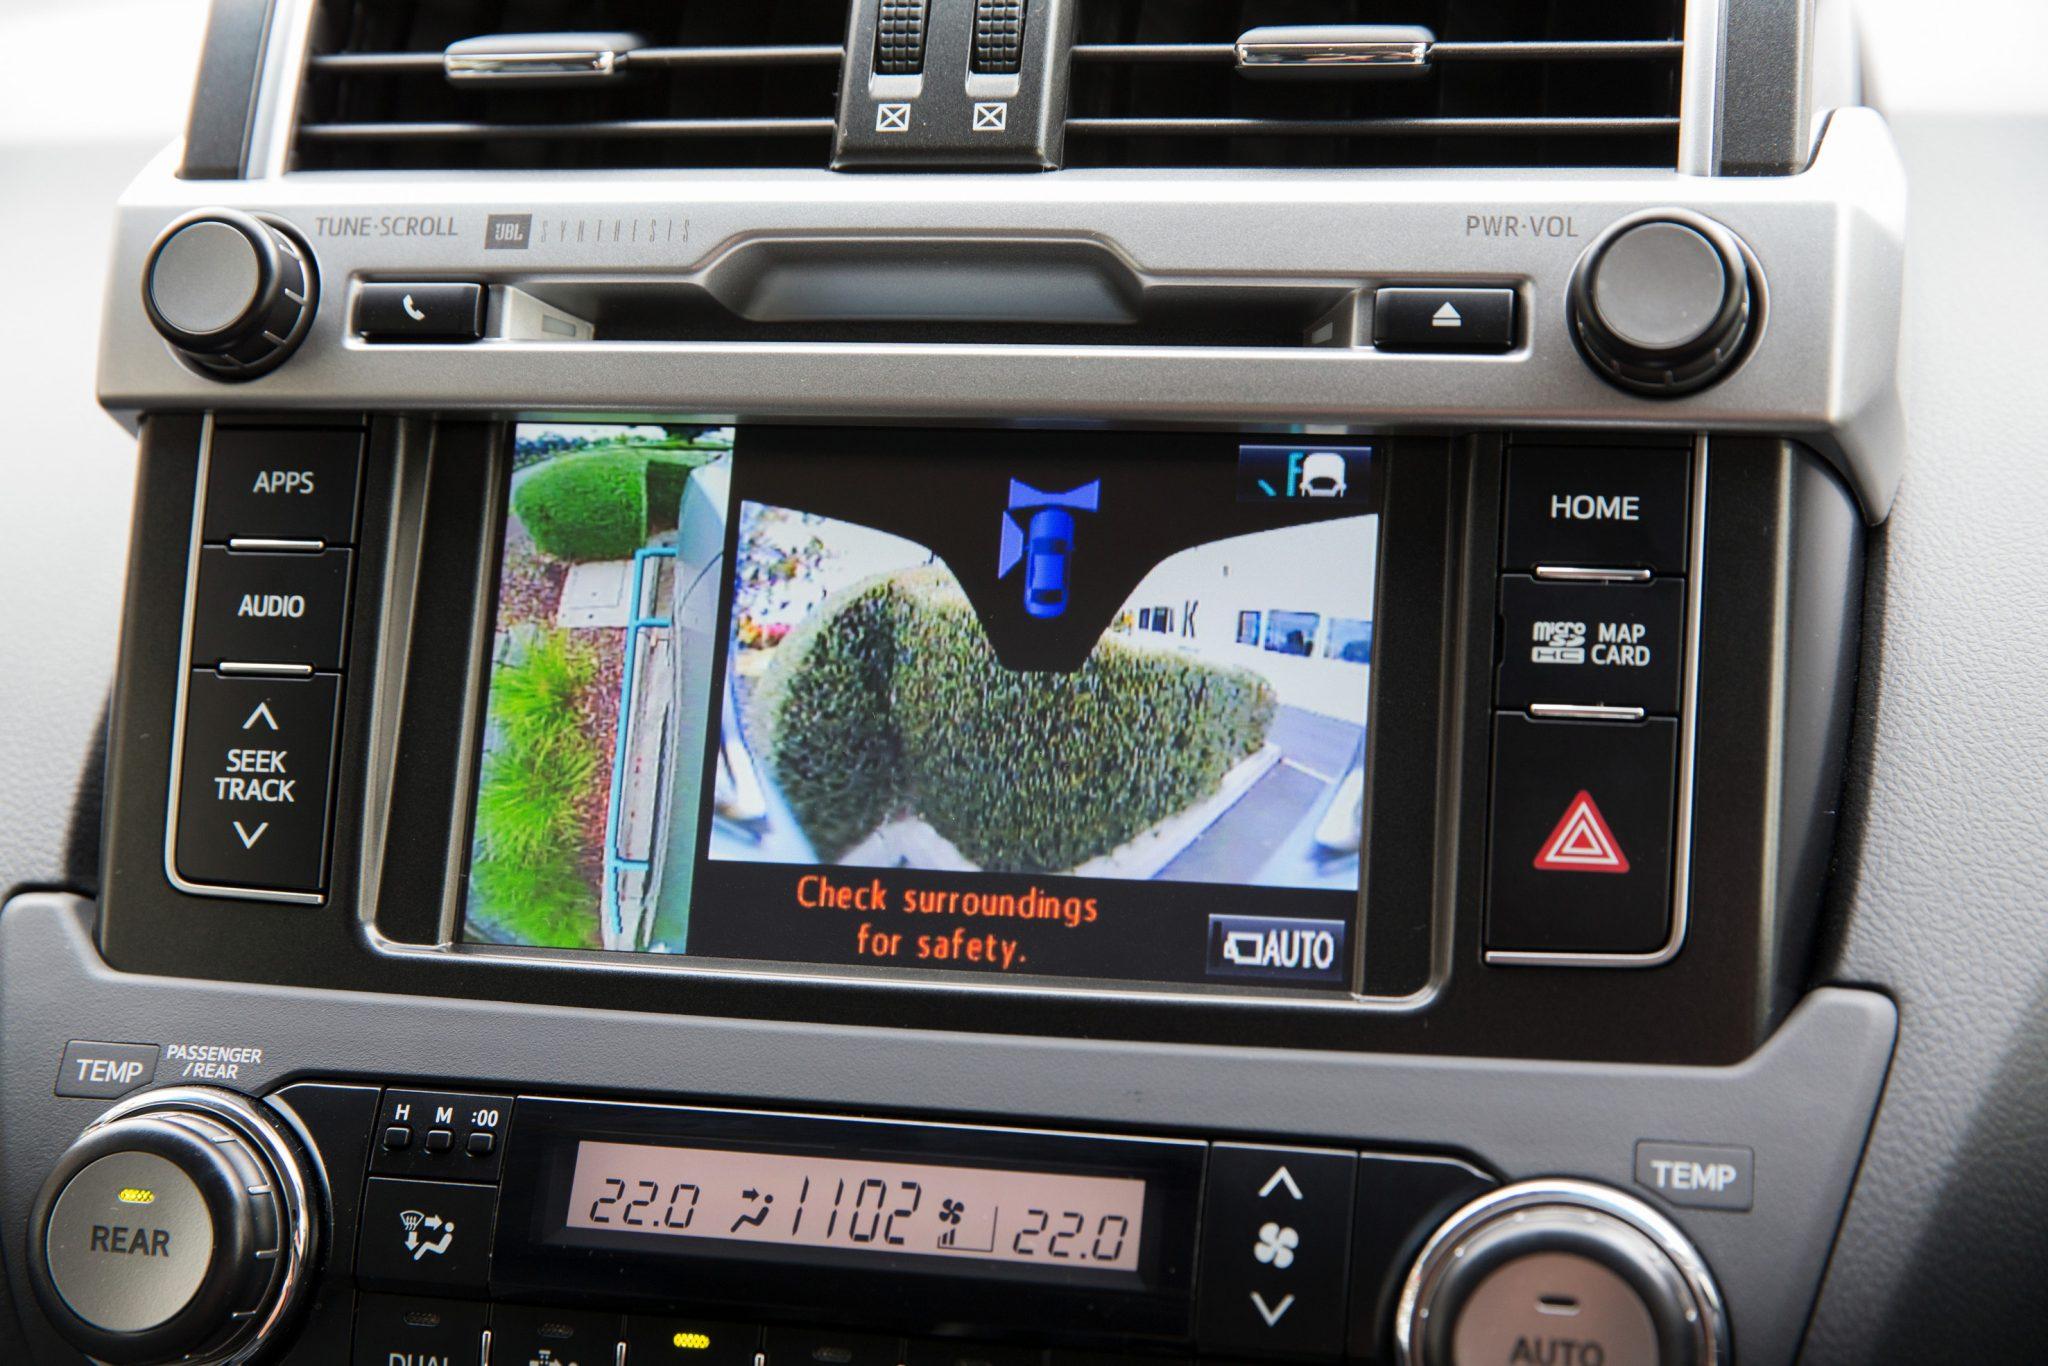 2013 Toyota Prado Kakadu Multi-Terrain Monitor - ForceGT.com